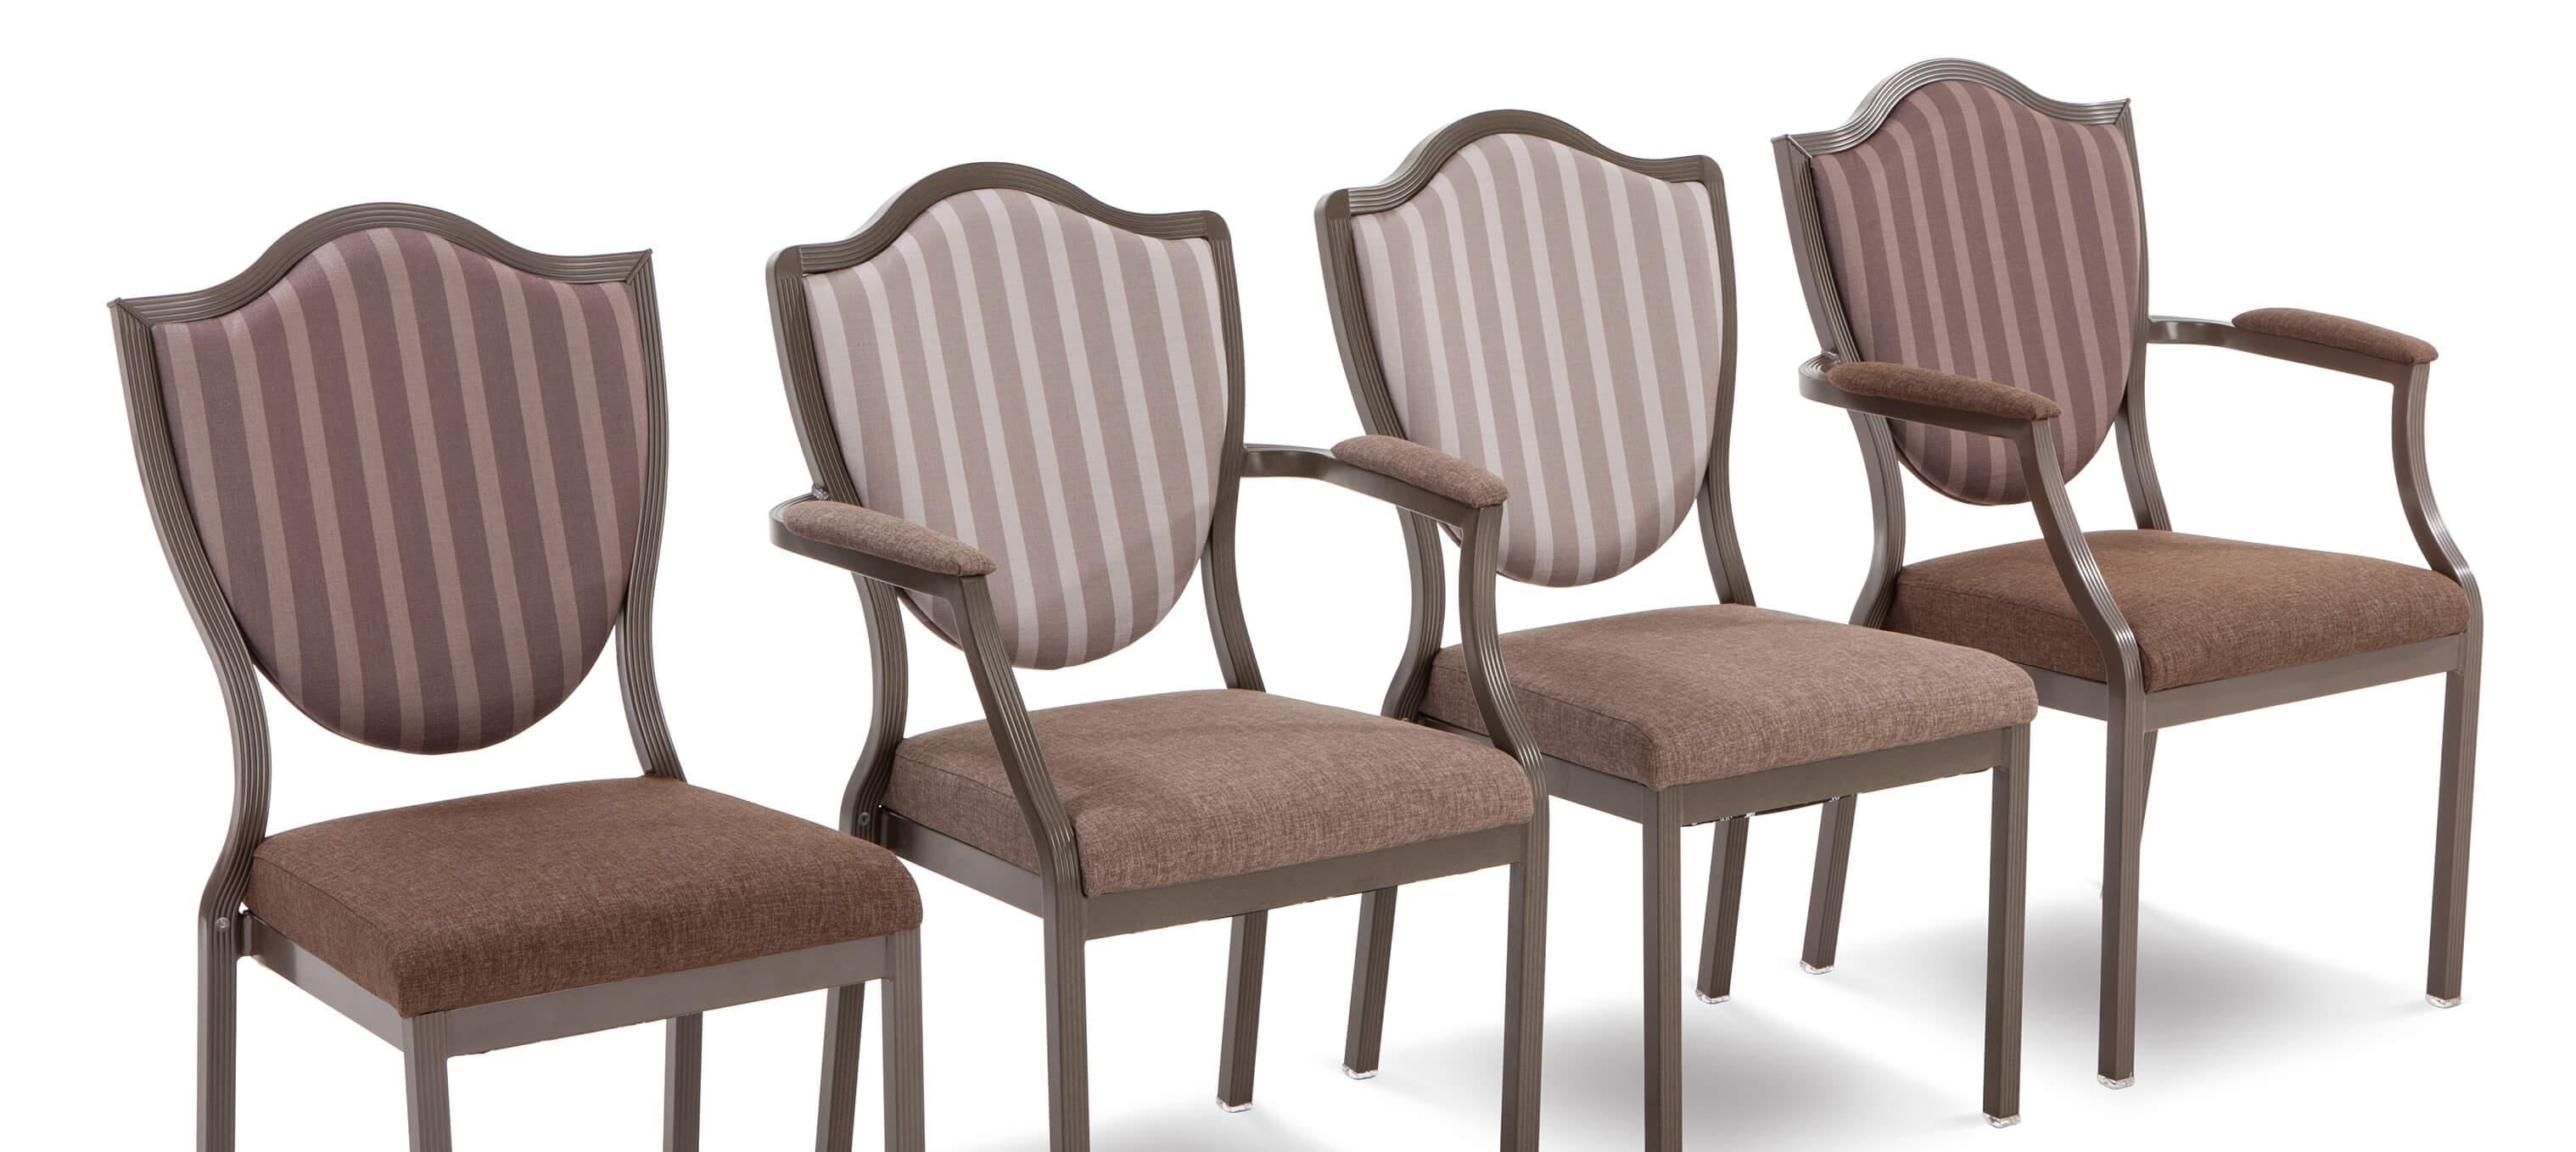 Salon Chair Range - Hero 1500x1671